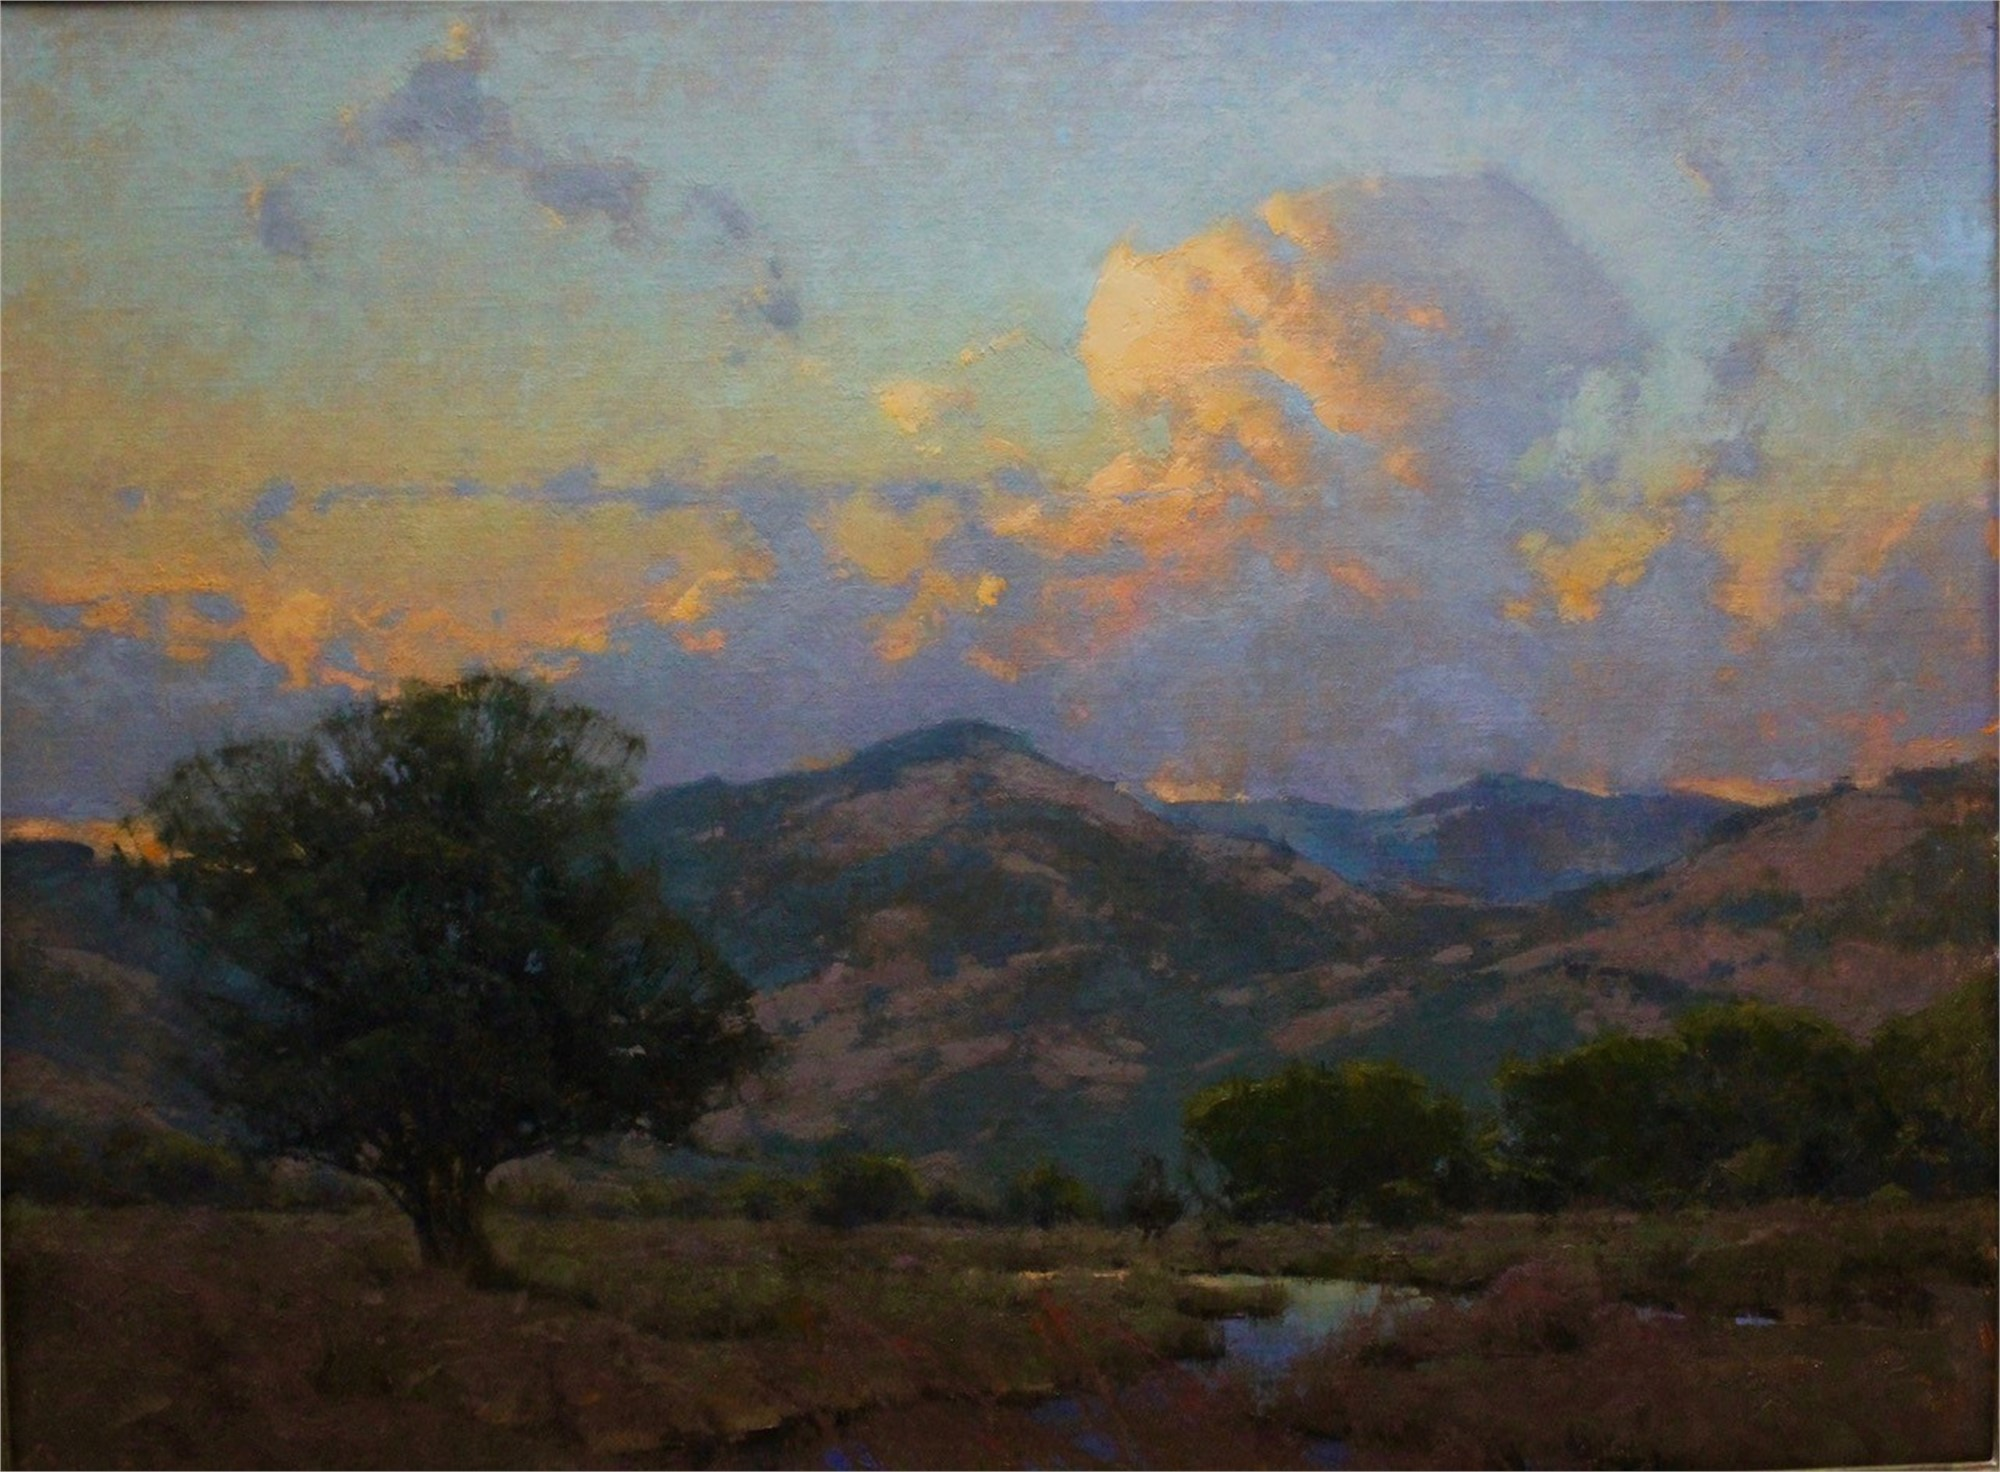 Summer Sky at Evening by Michael J Lynch